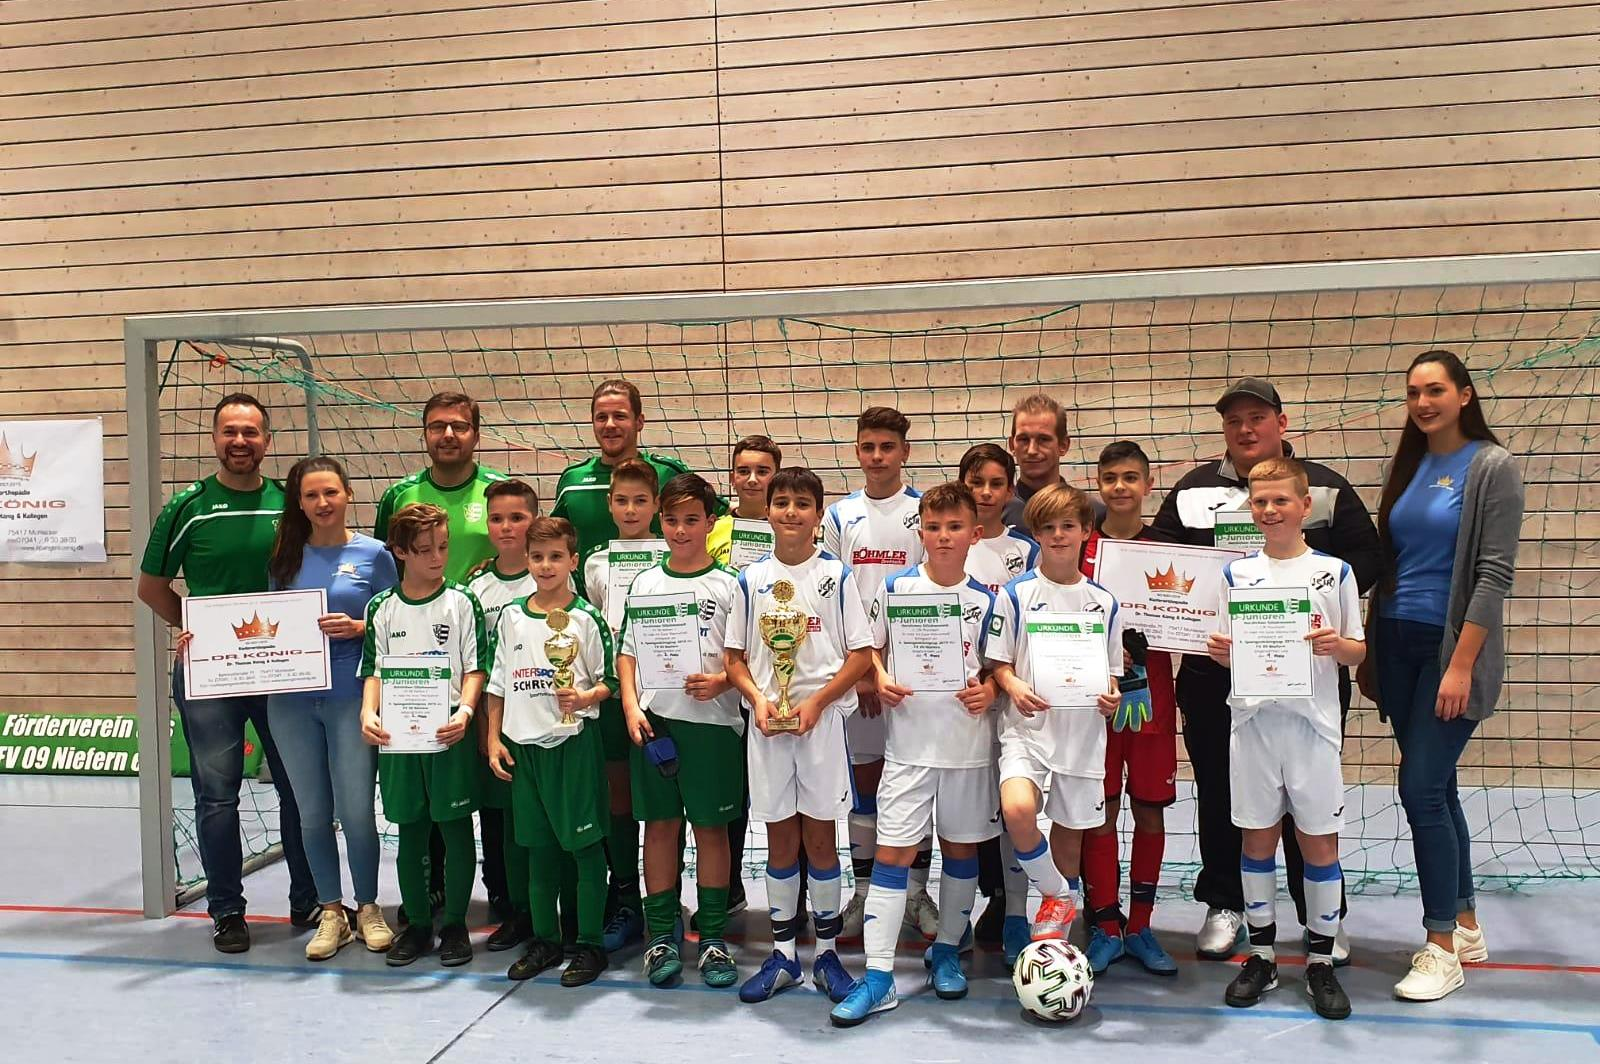 D1-Junioren feiern Turniersieg